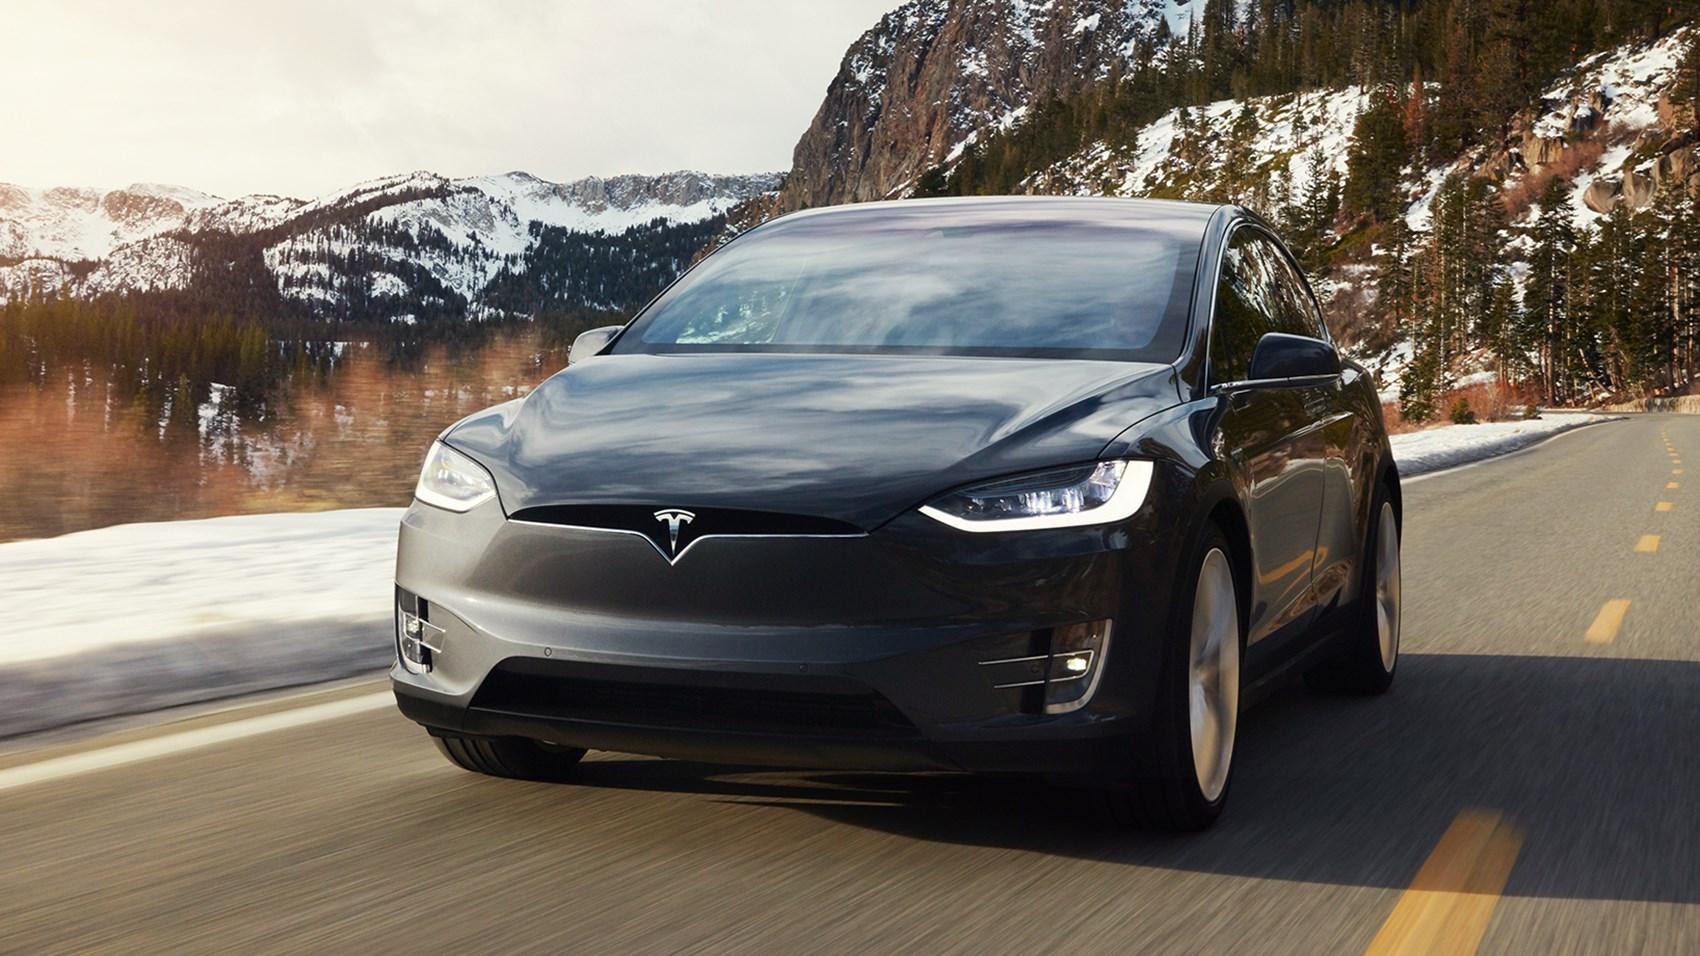 New Tesla Model X 2018 Review (2020) | CAR Magazine